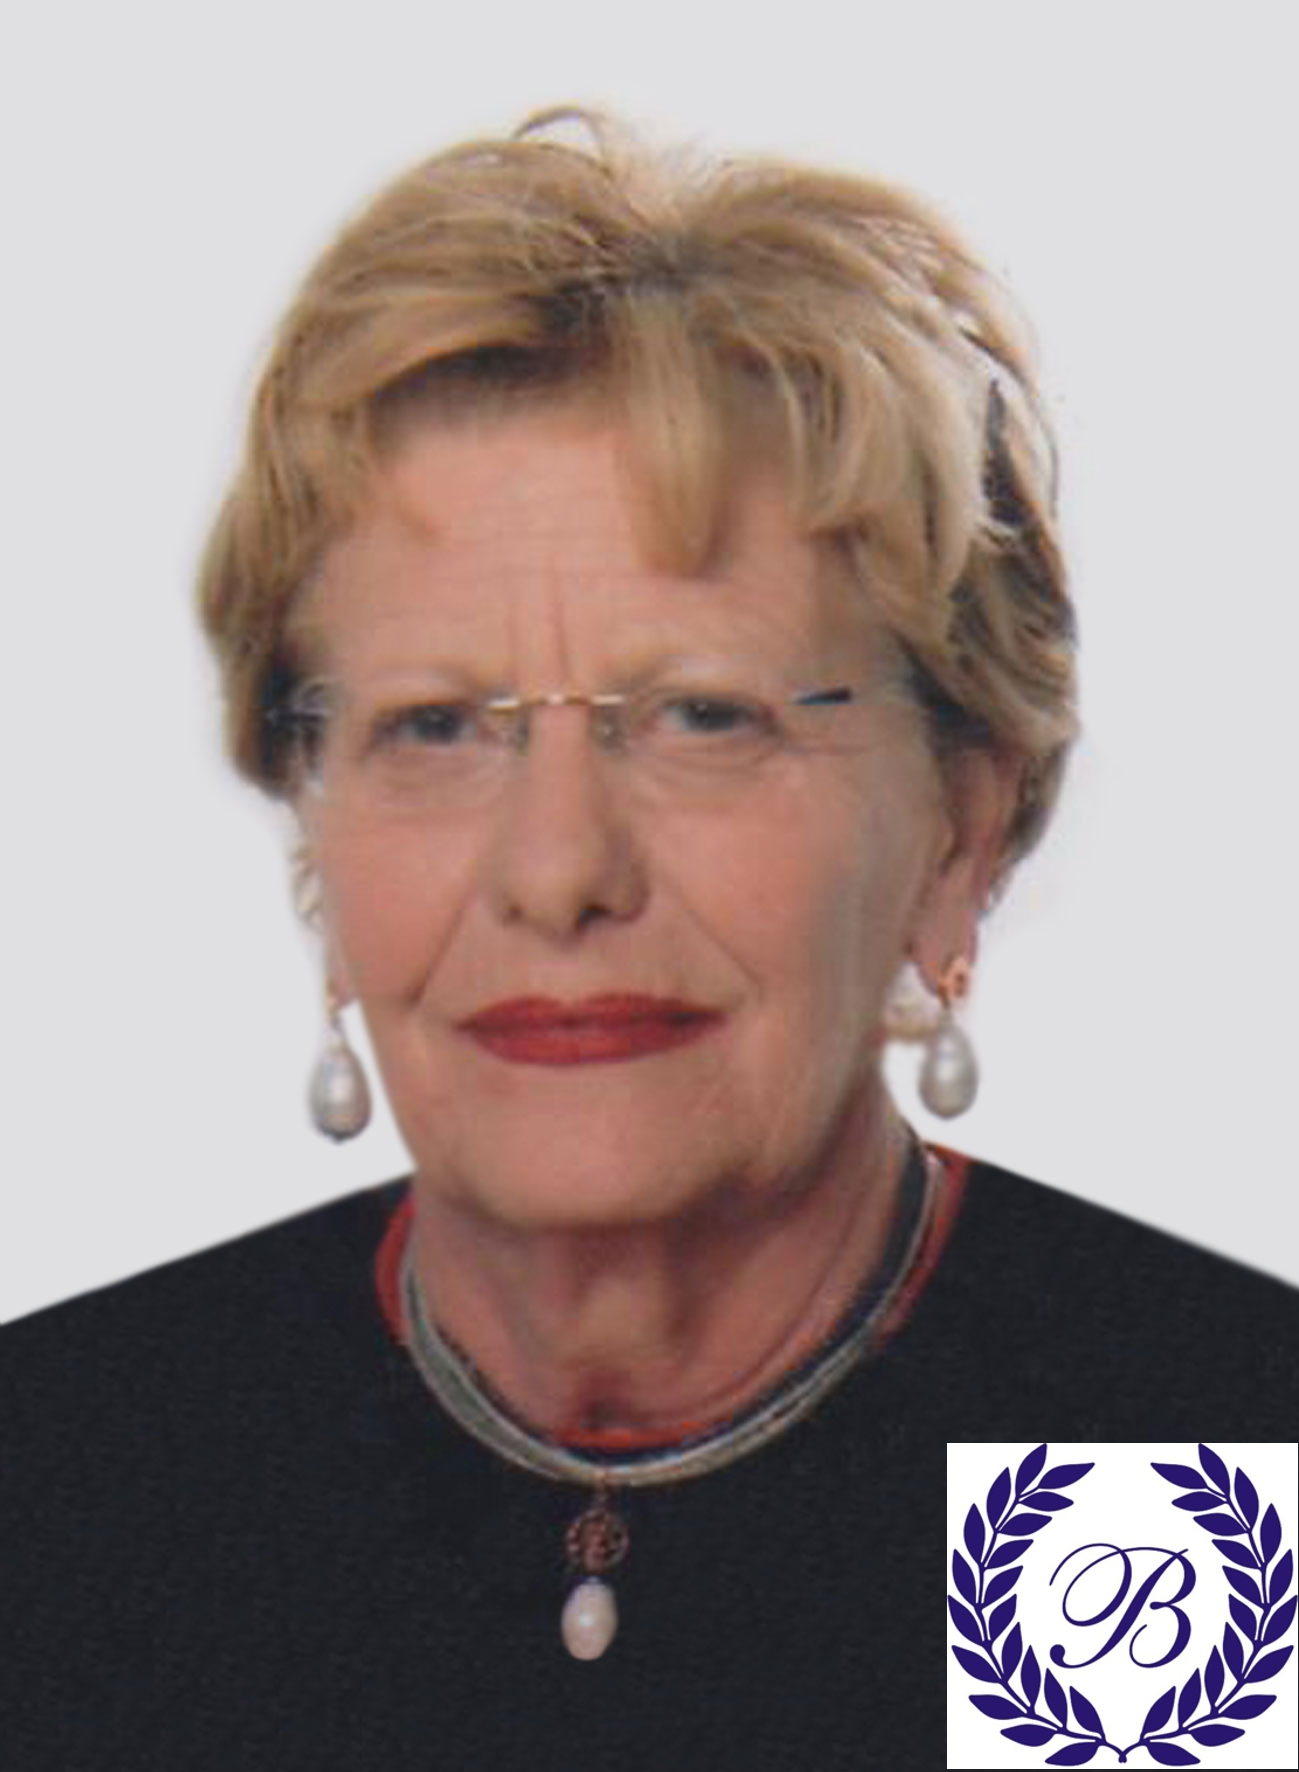 Trigesimo Lina Larosa